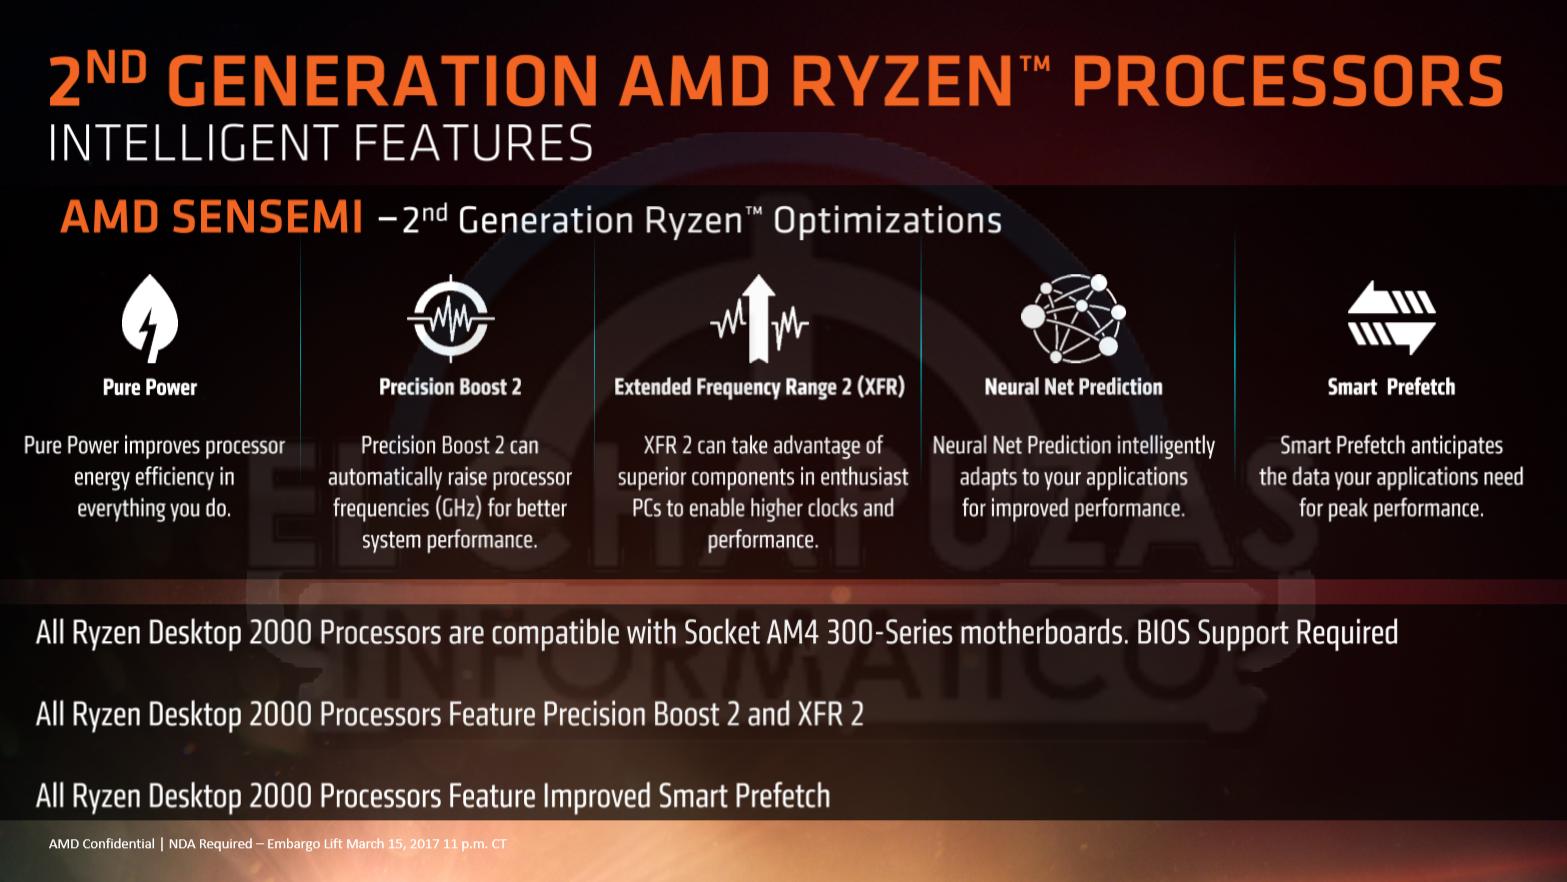 AMD-Ryzen-2000-tecnologias-2.png